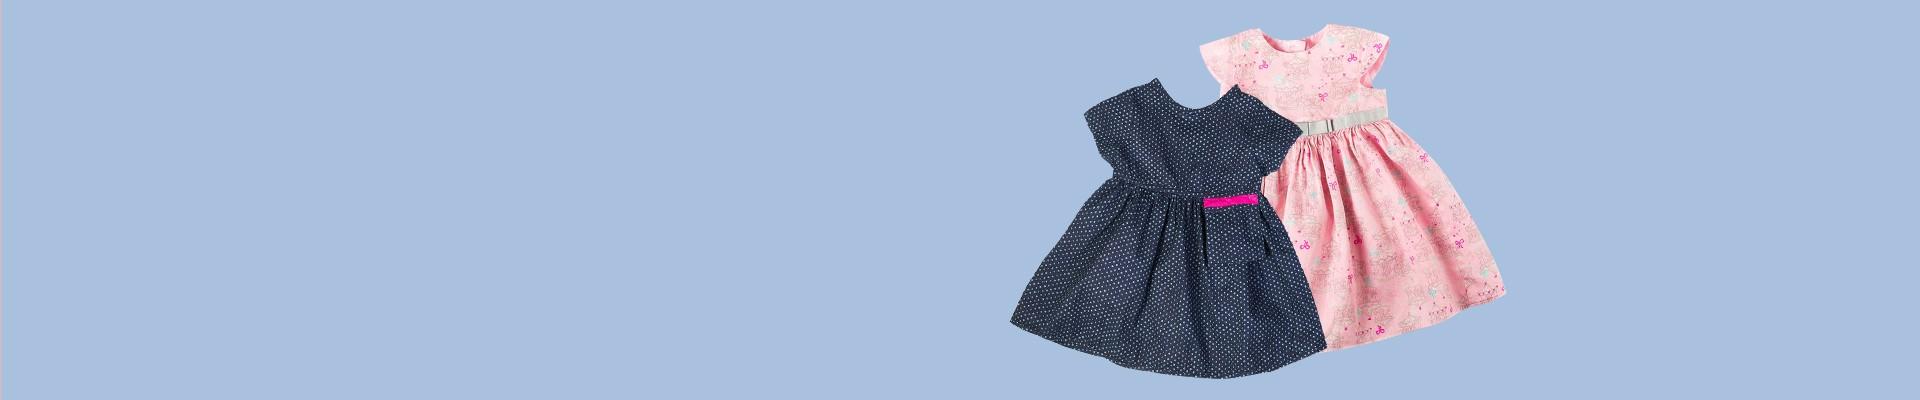 Jual Aneka Pilihan Dress Anak Perempuan Terbaru